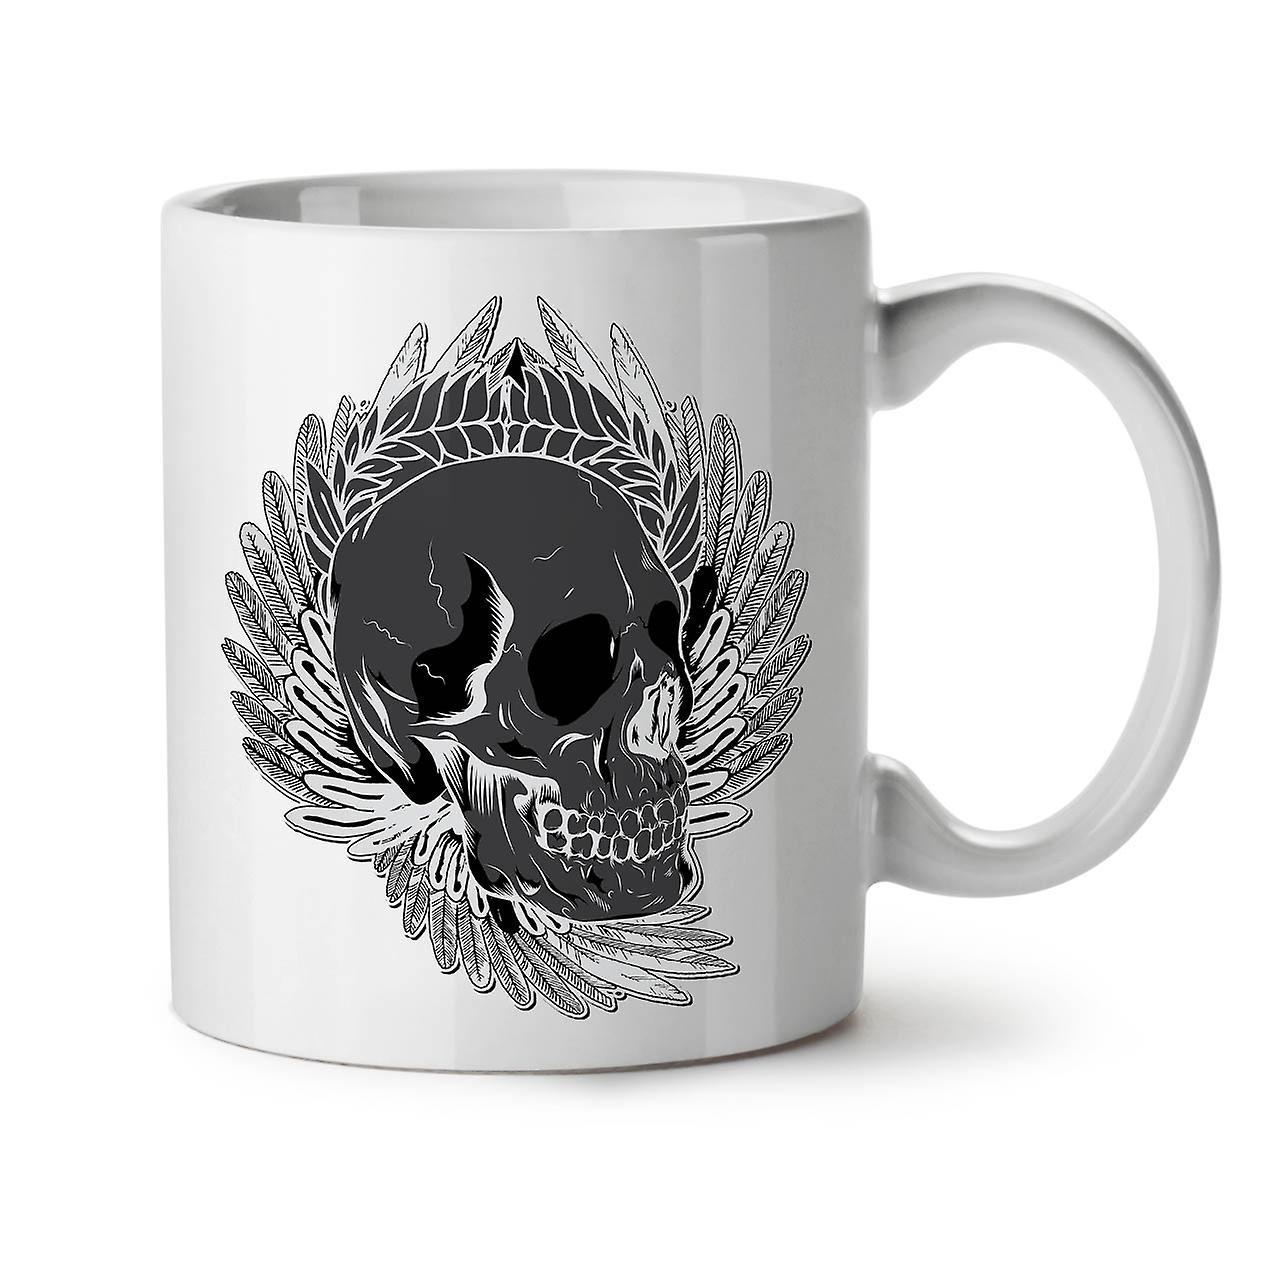 Skull Plume Tasse Céramique Thé Café Rose 11 Nouveau Dead OzWellcoda Blanc 5Rj3Lq4A